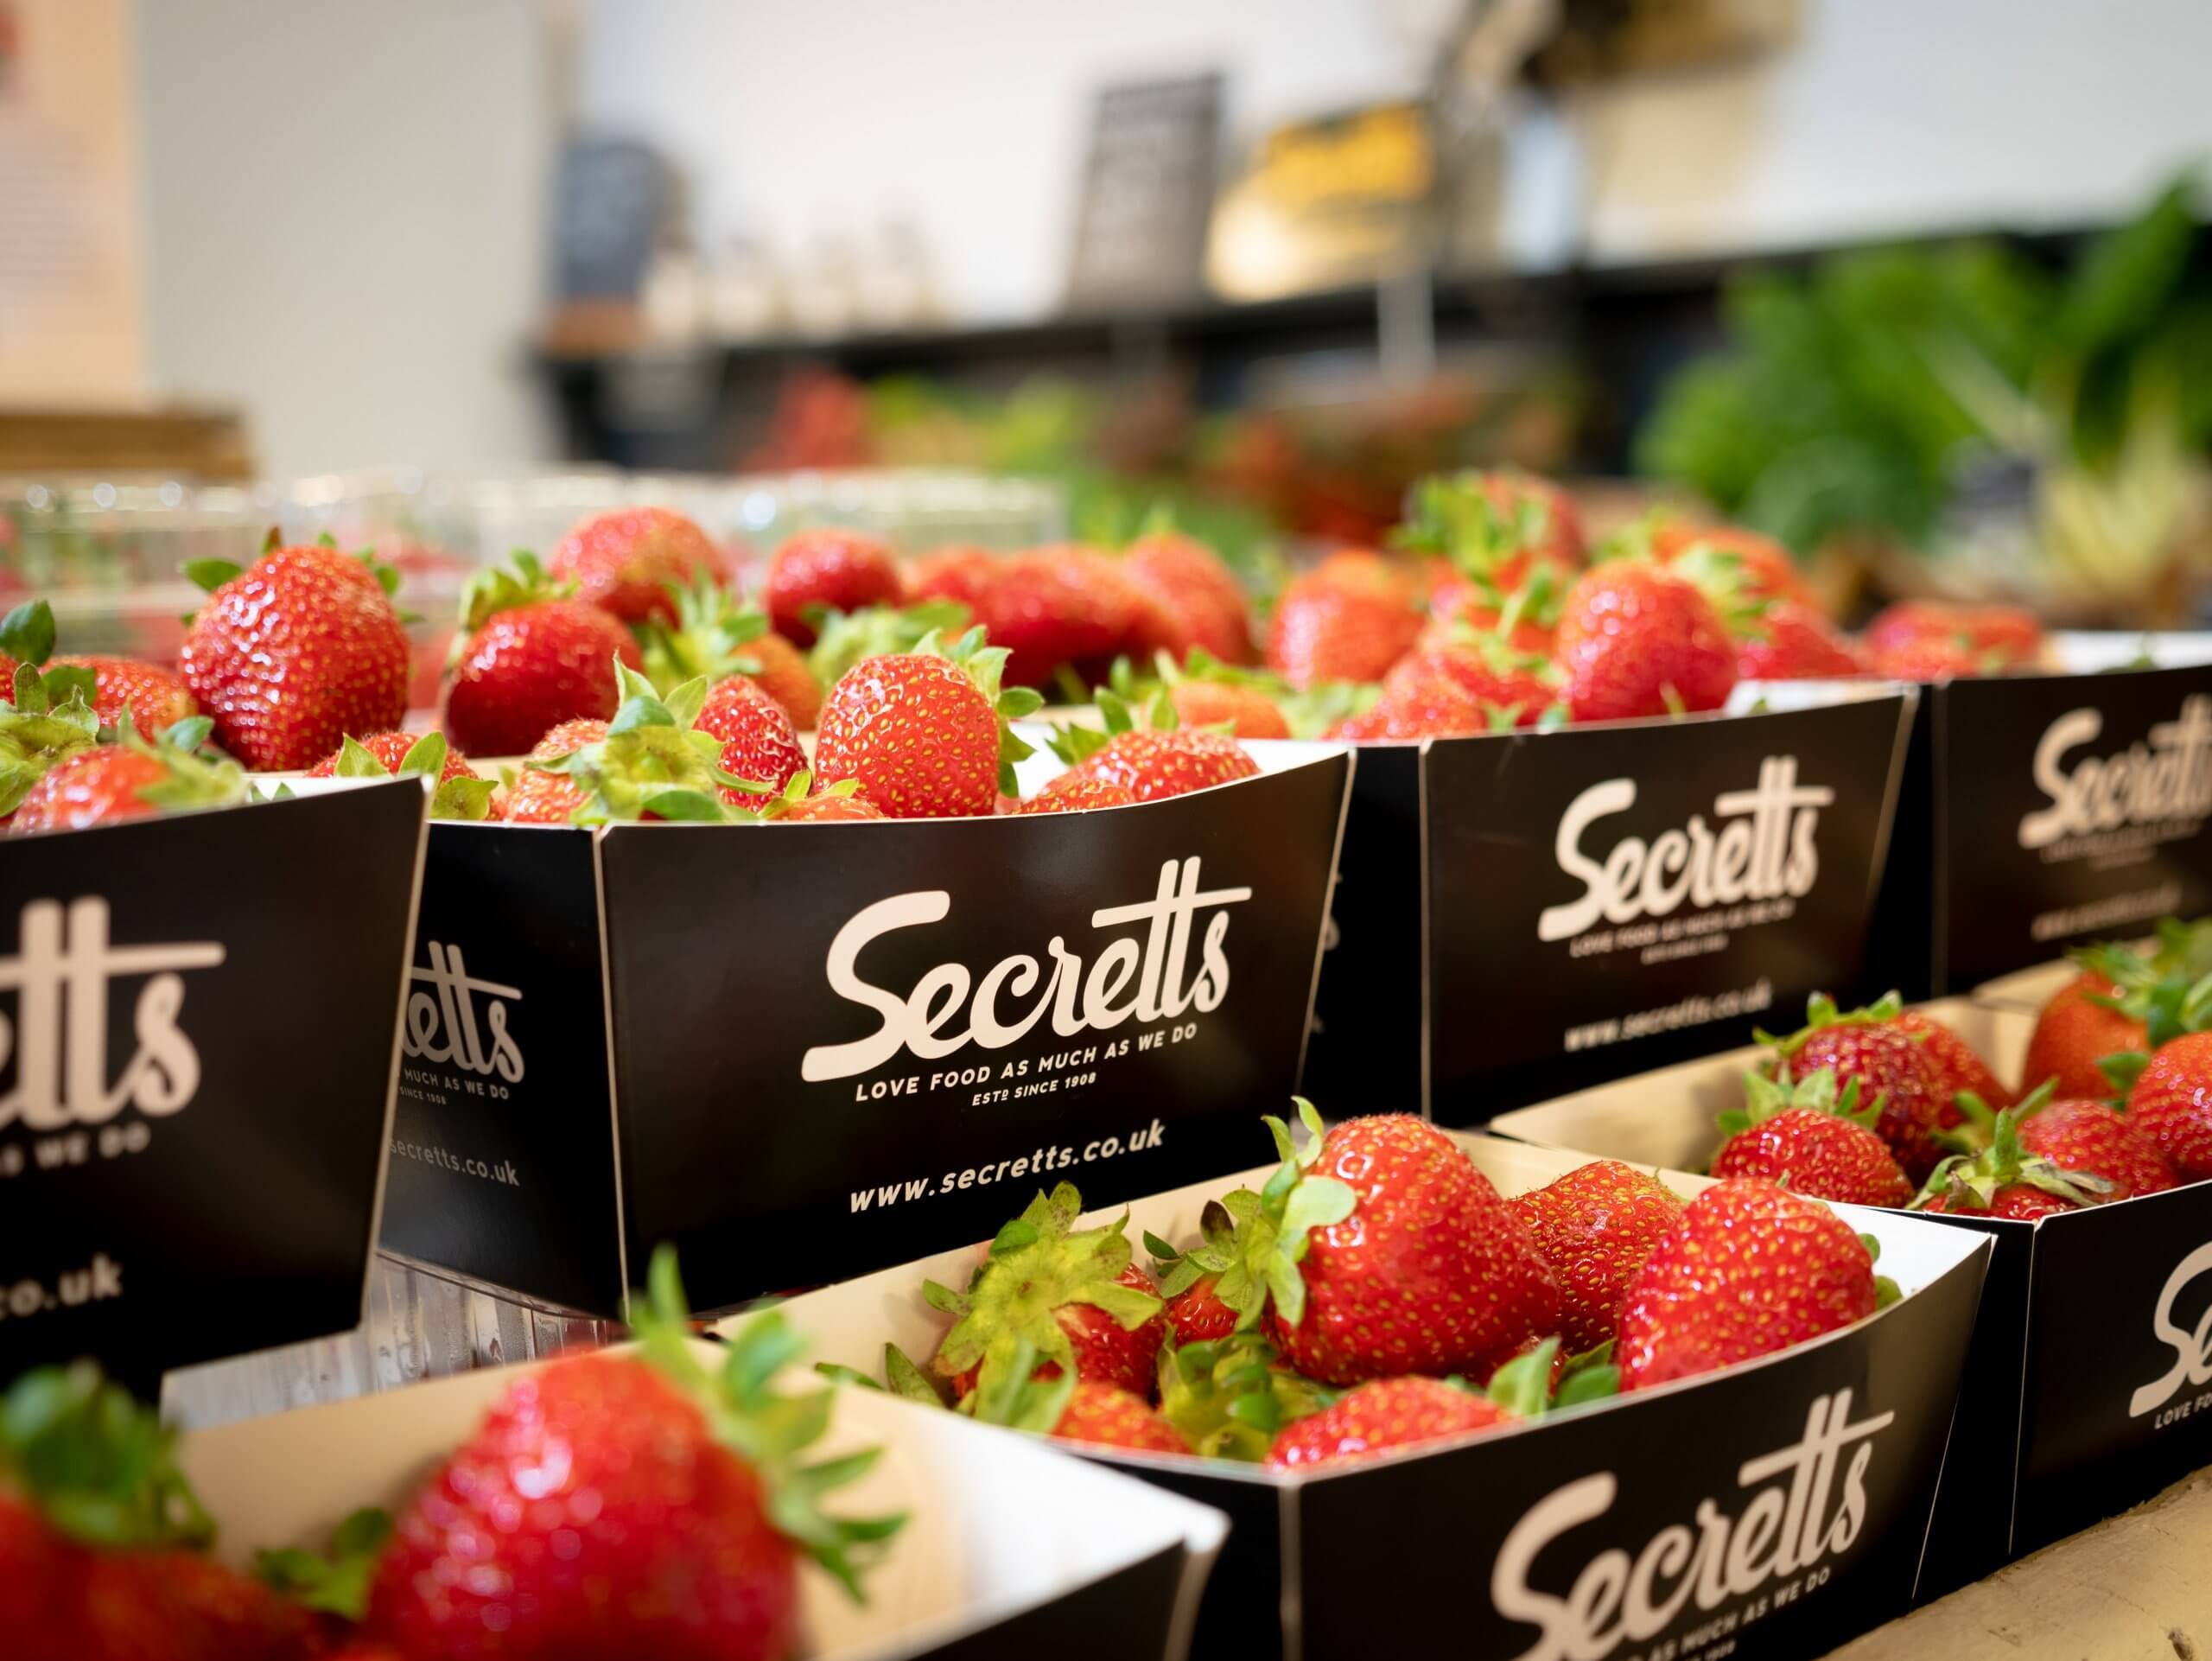 Secretts Strawberries   The Mustcard